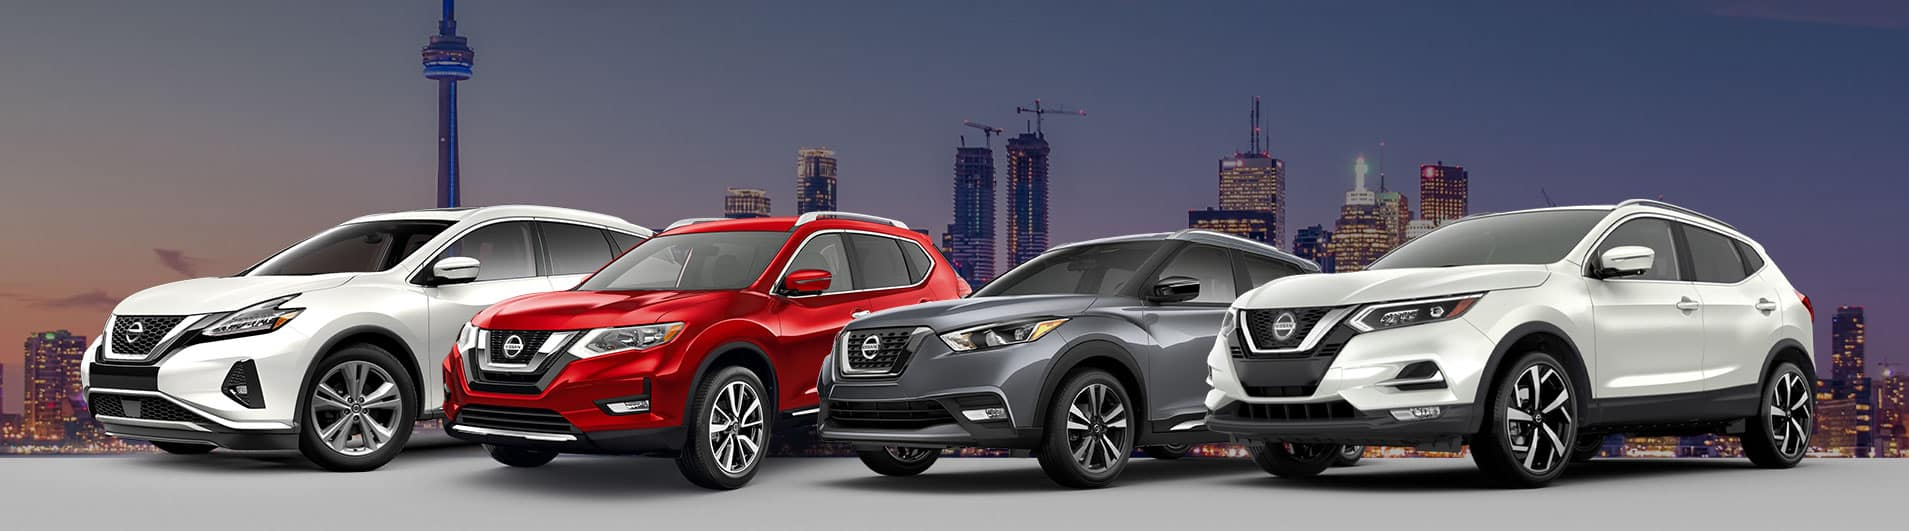 2021 & 2020 Nissan Vehicles at Village Nissan